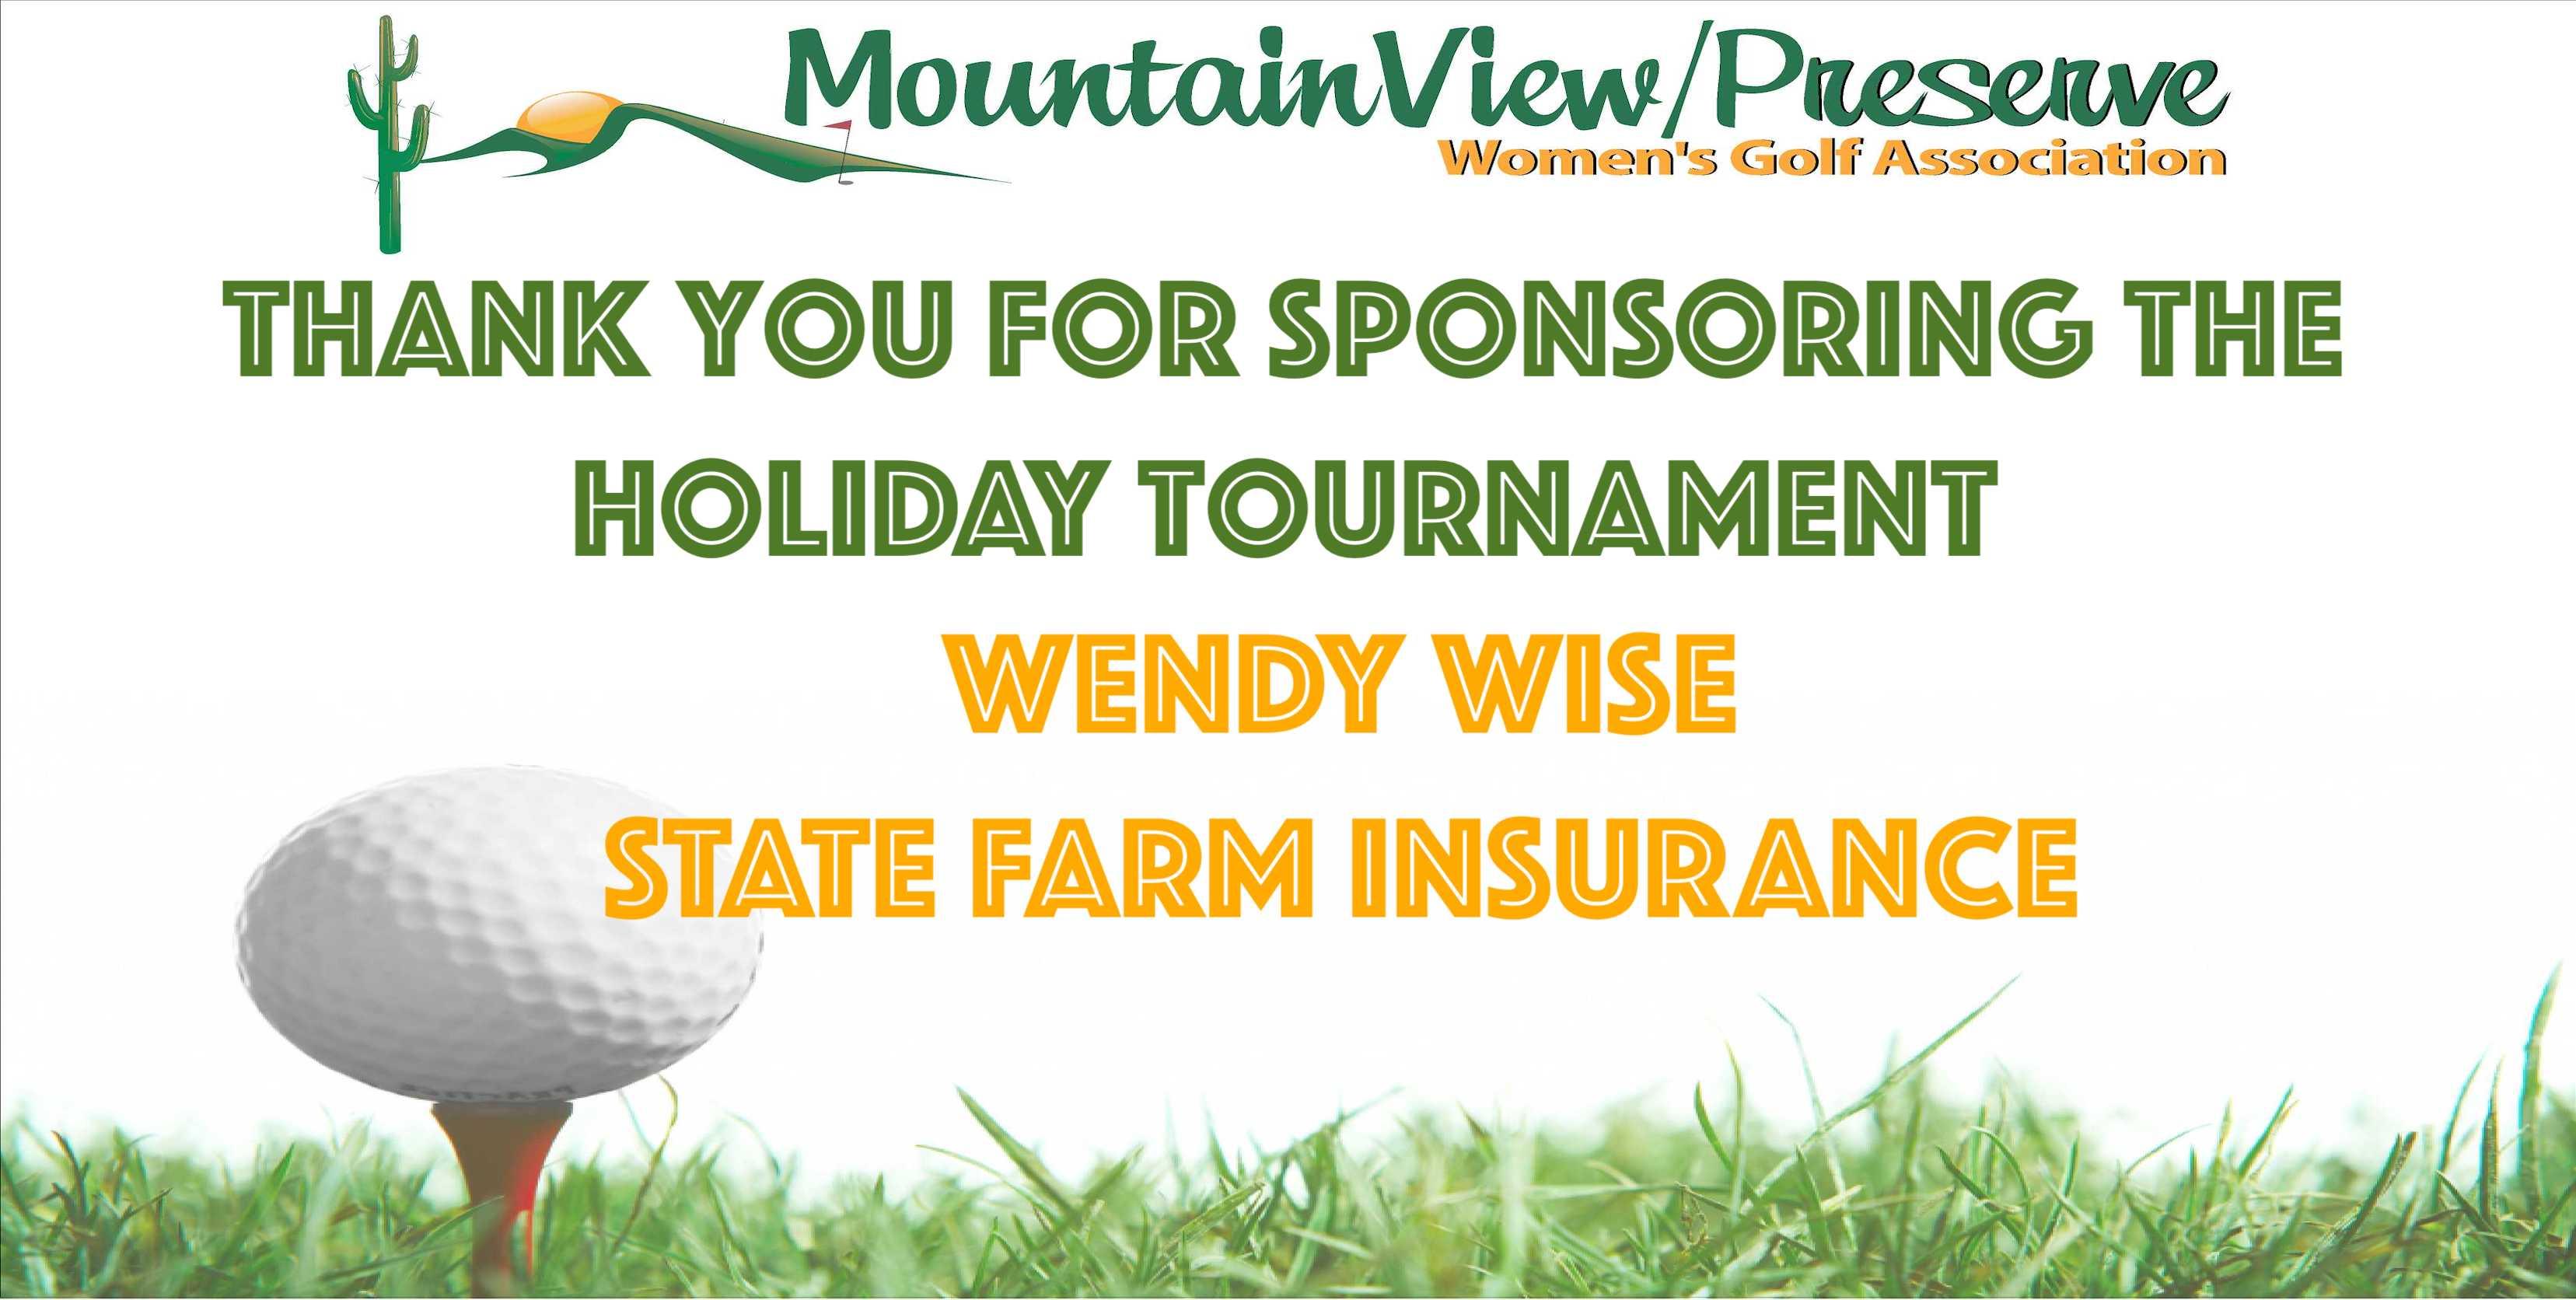 Spnr_Tournament-WendyWiseStateFarm